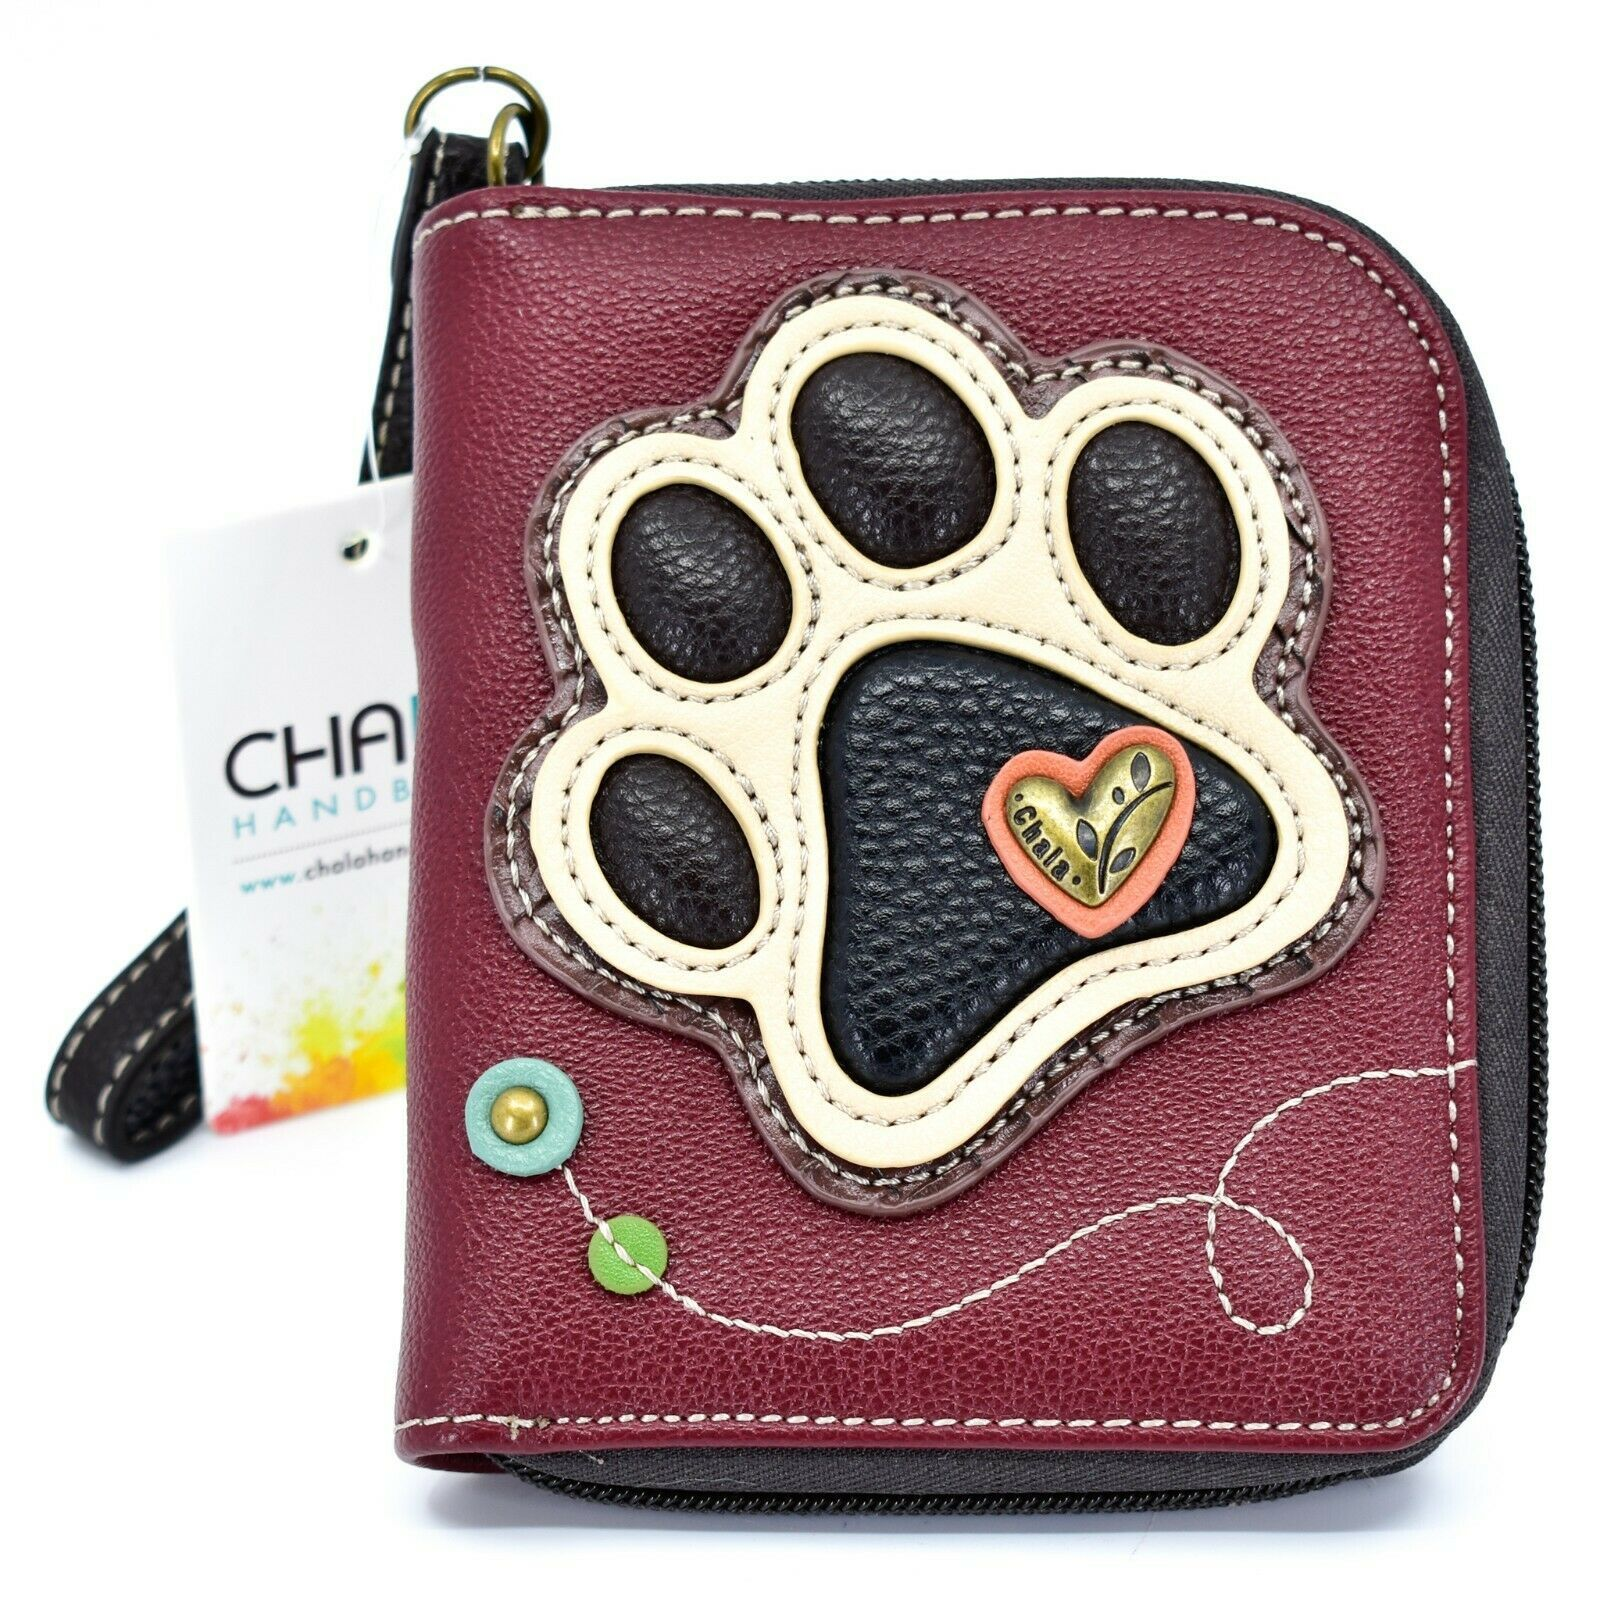 Chala Handbags Faux Leather Ivory Paw Print on Maroon Zip Around Wristlet Wallet